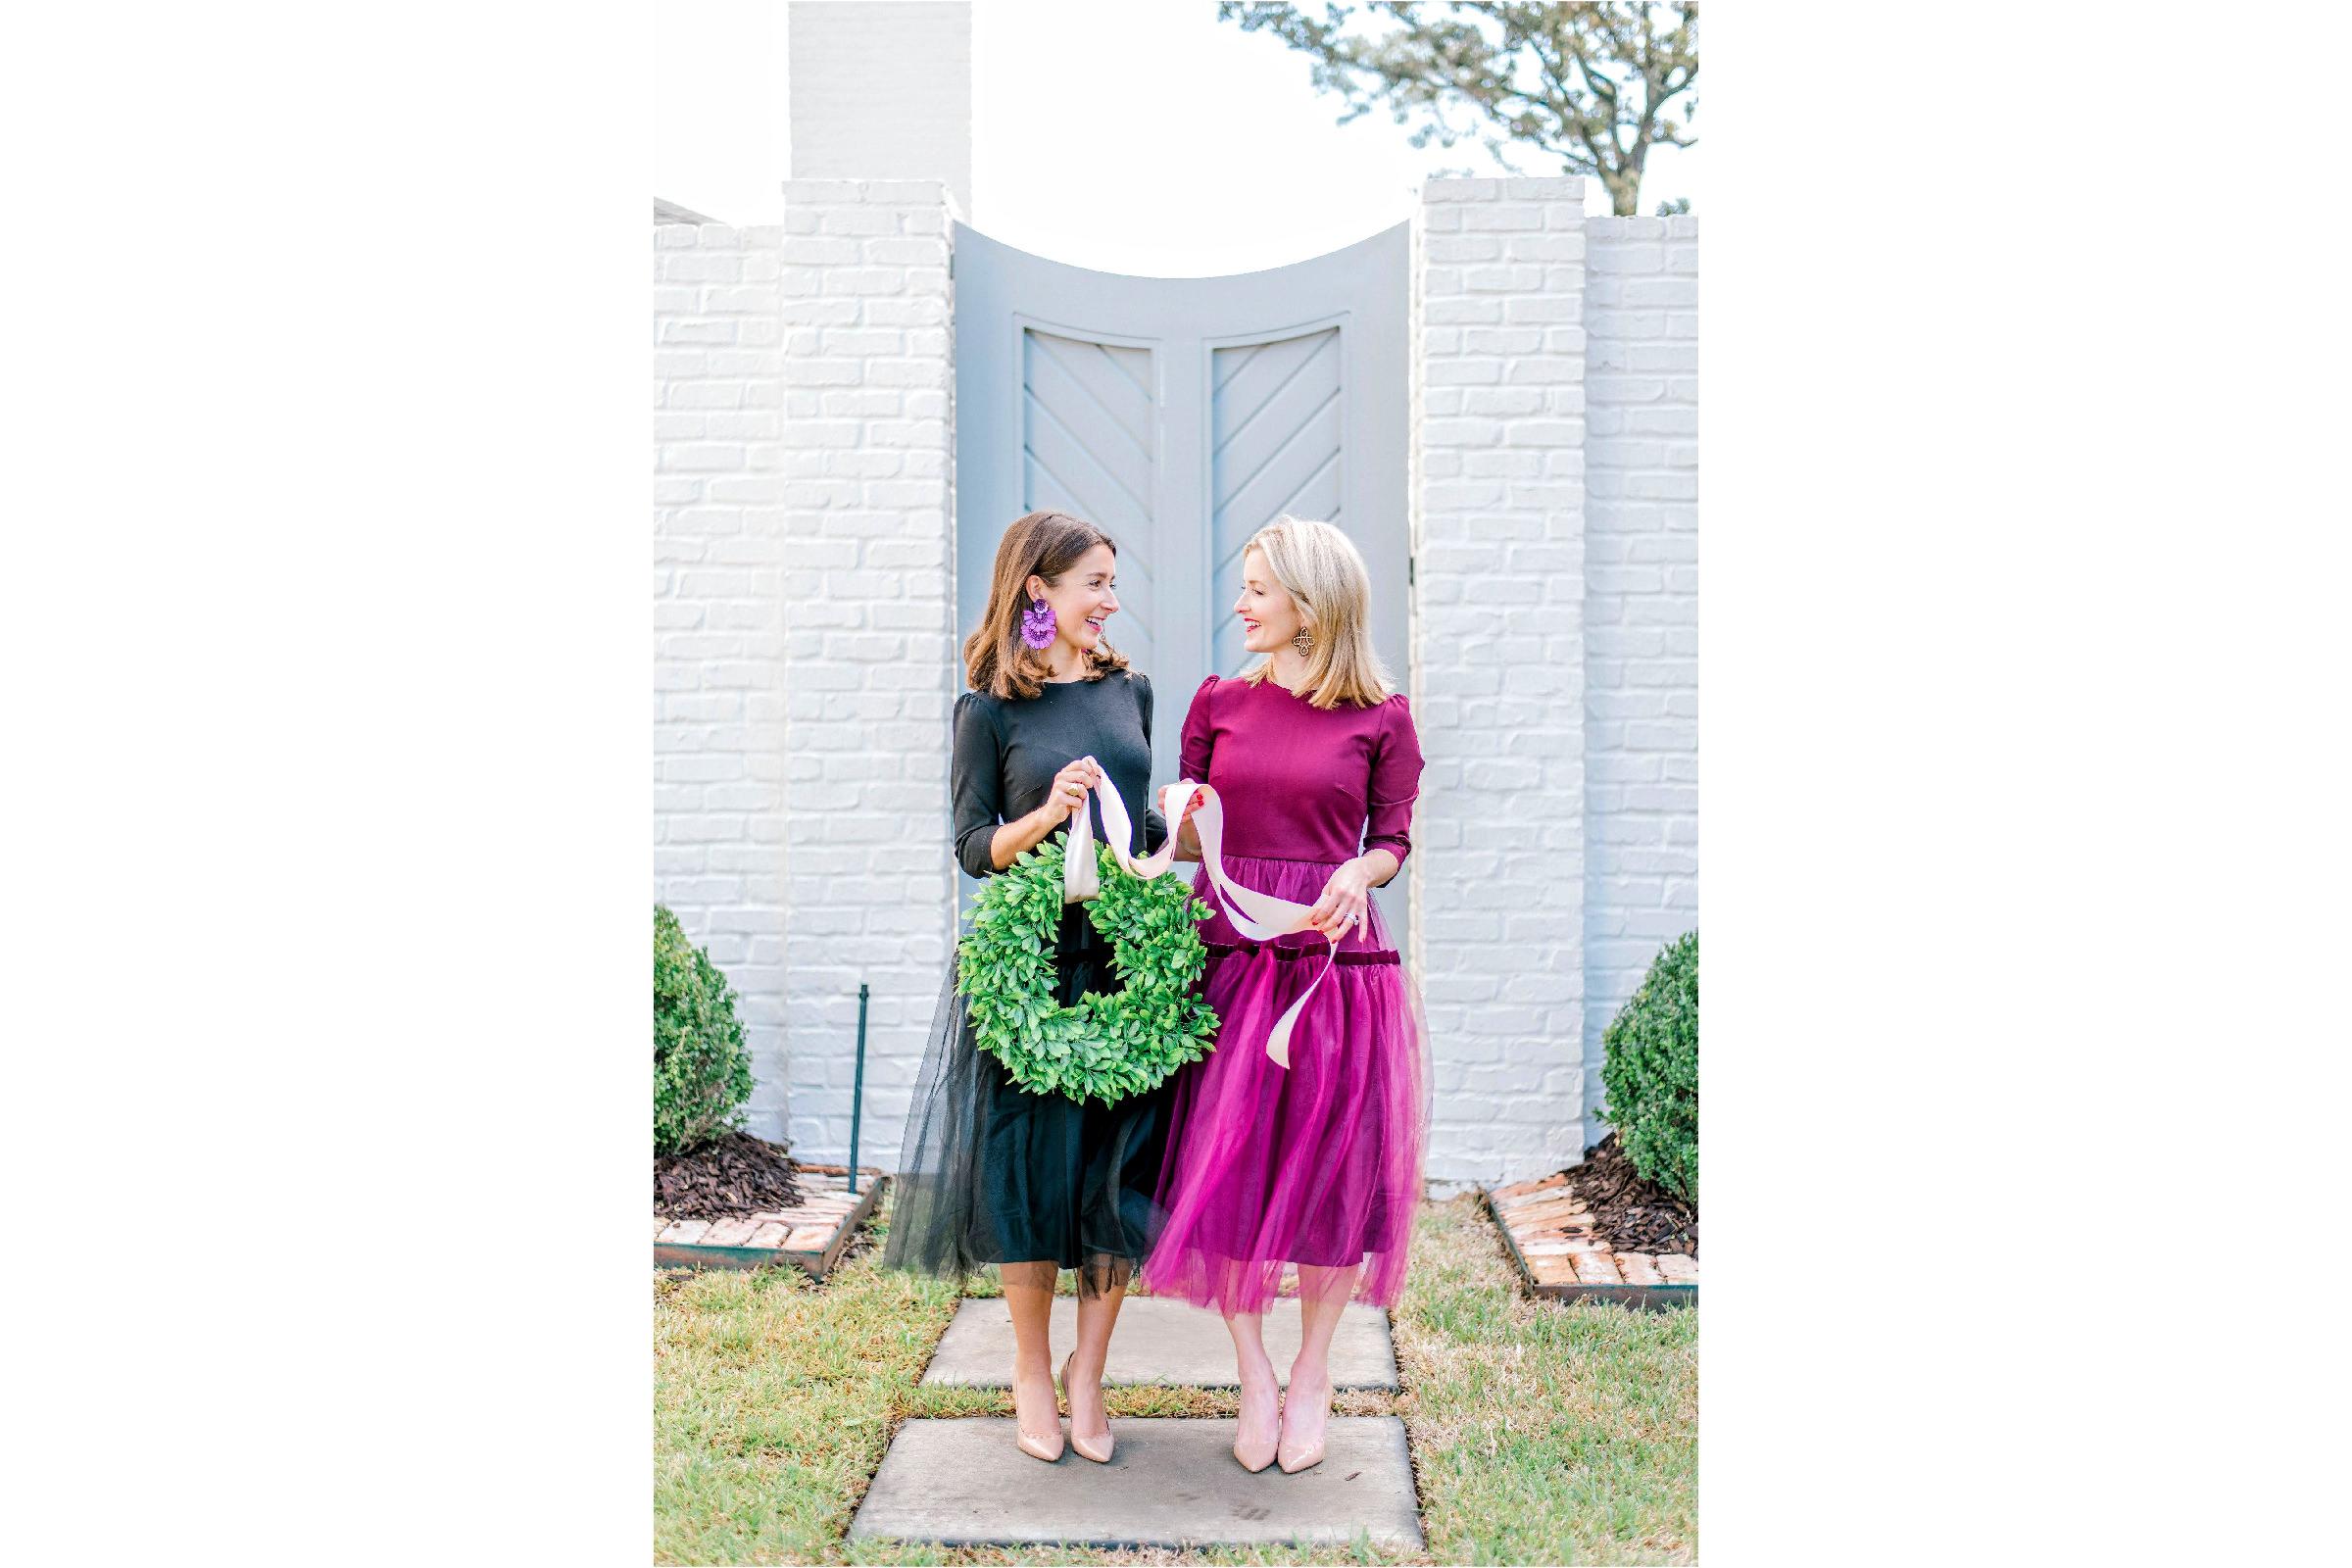 Lisi Lerch Lookbook Holiday 2019